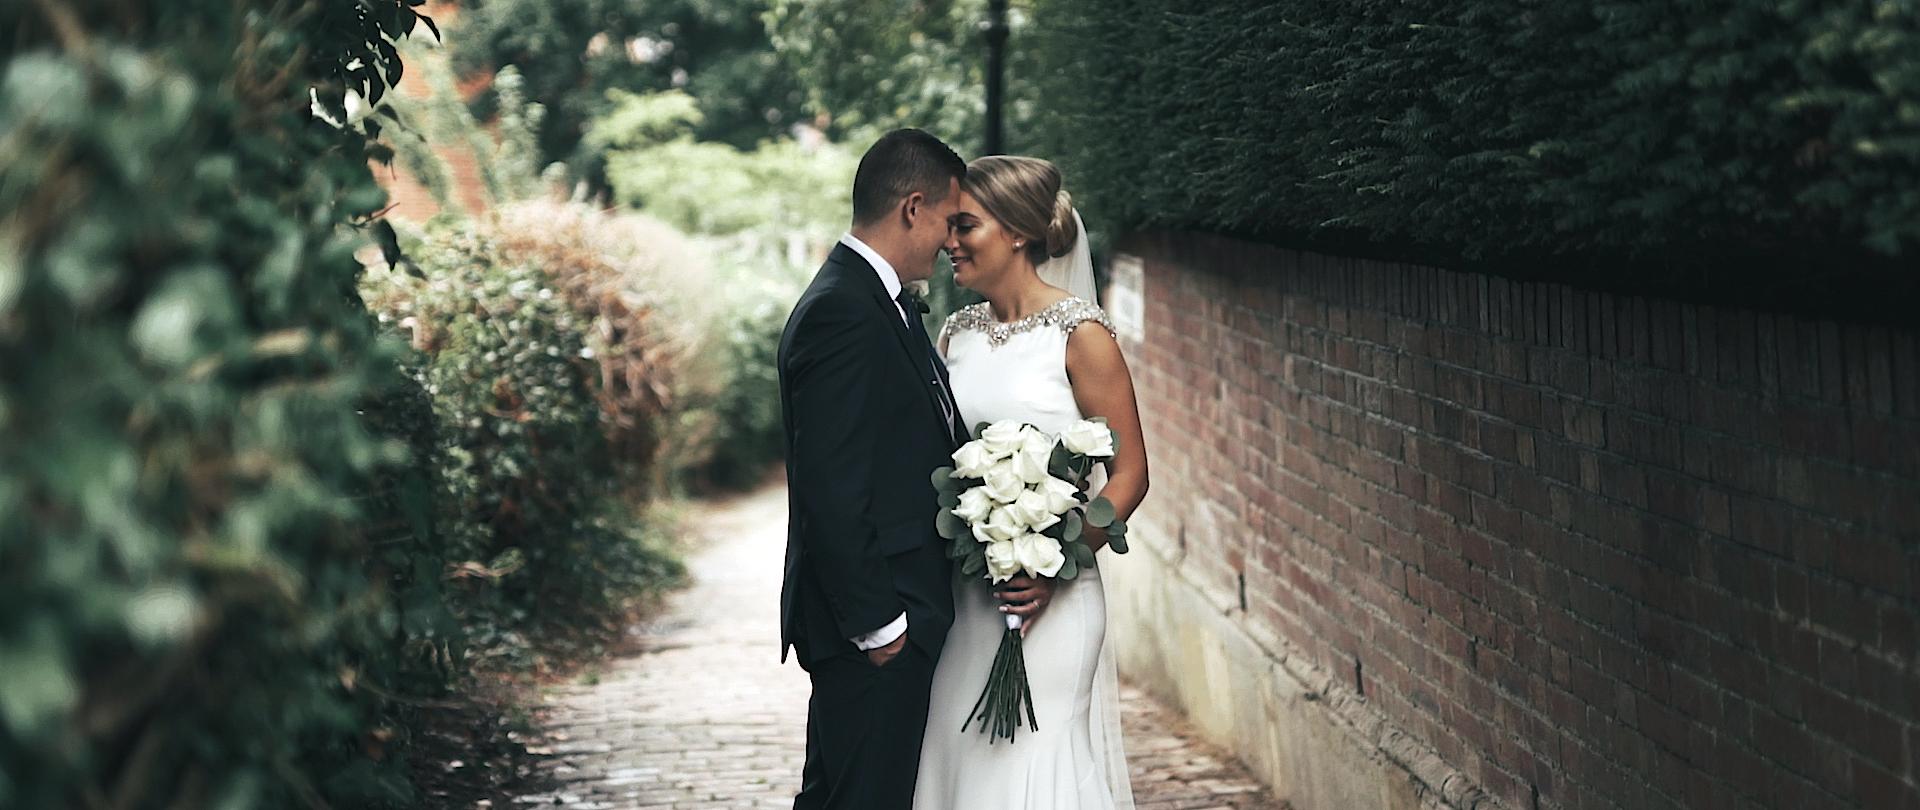 Kent Wedding Video - Philip Smith Visuals